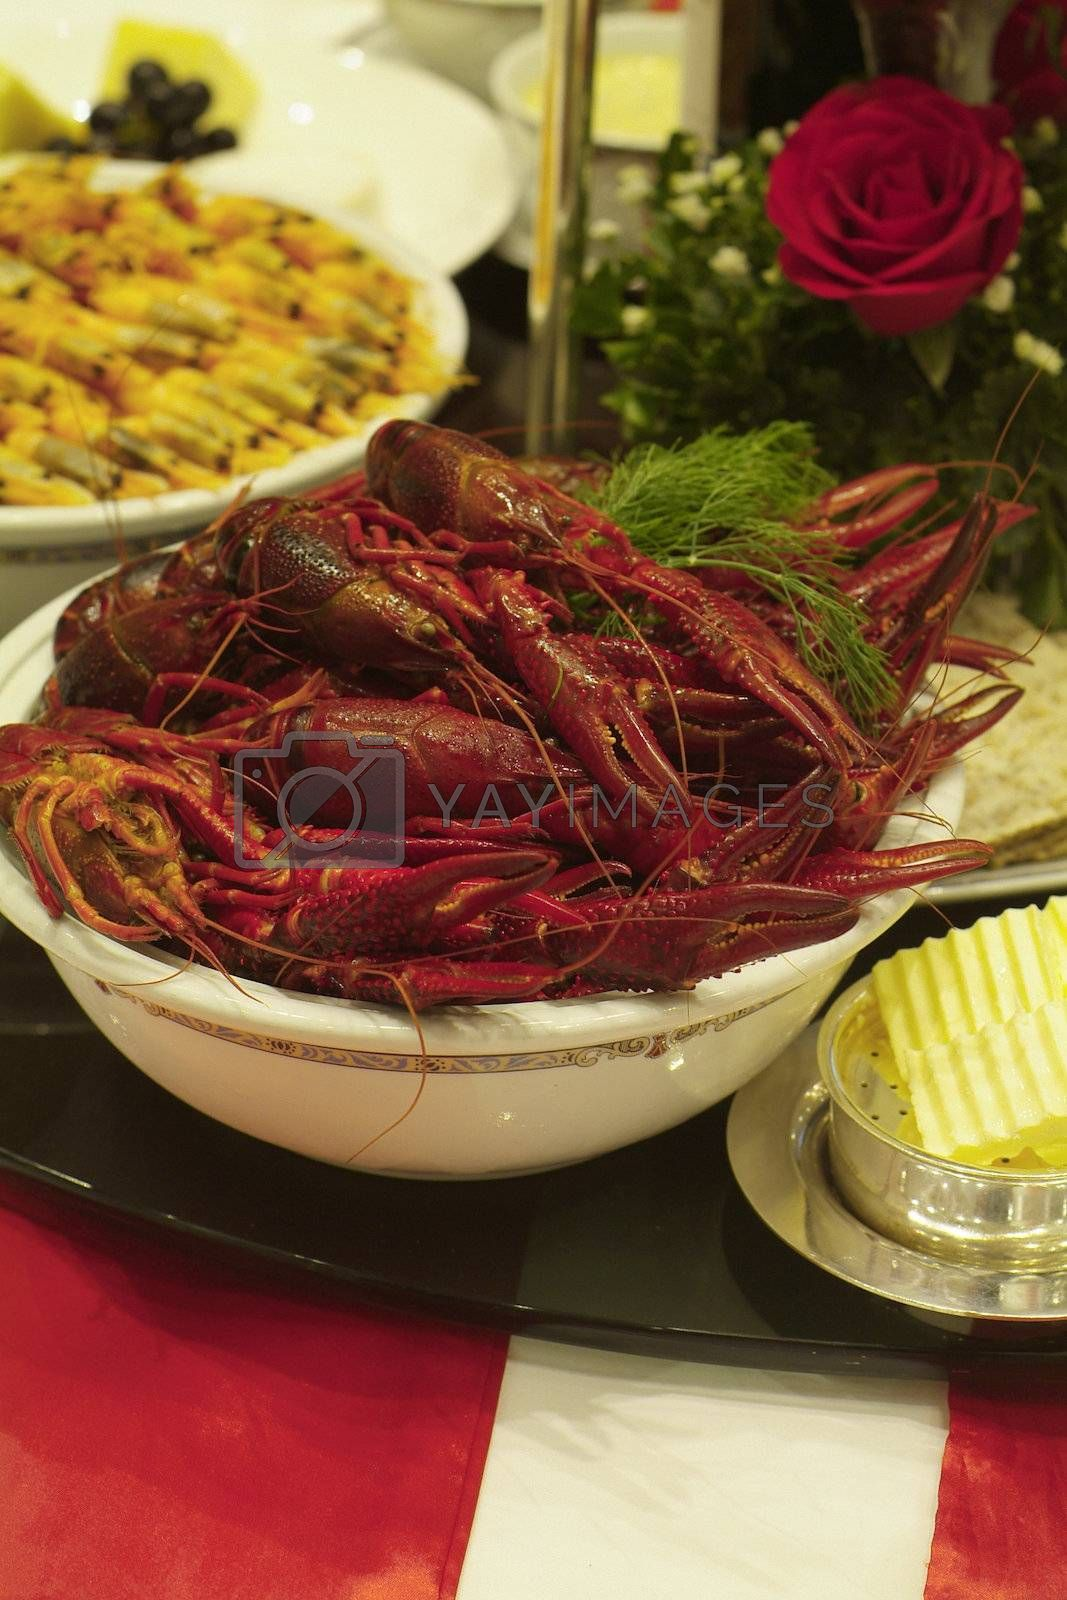 Crayfish and shrimps by epixx